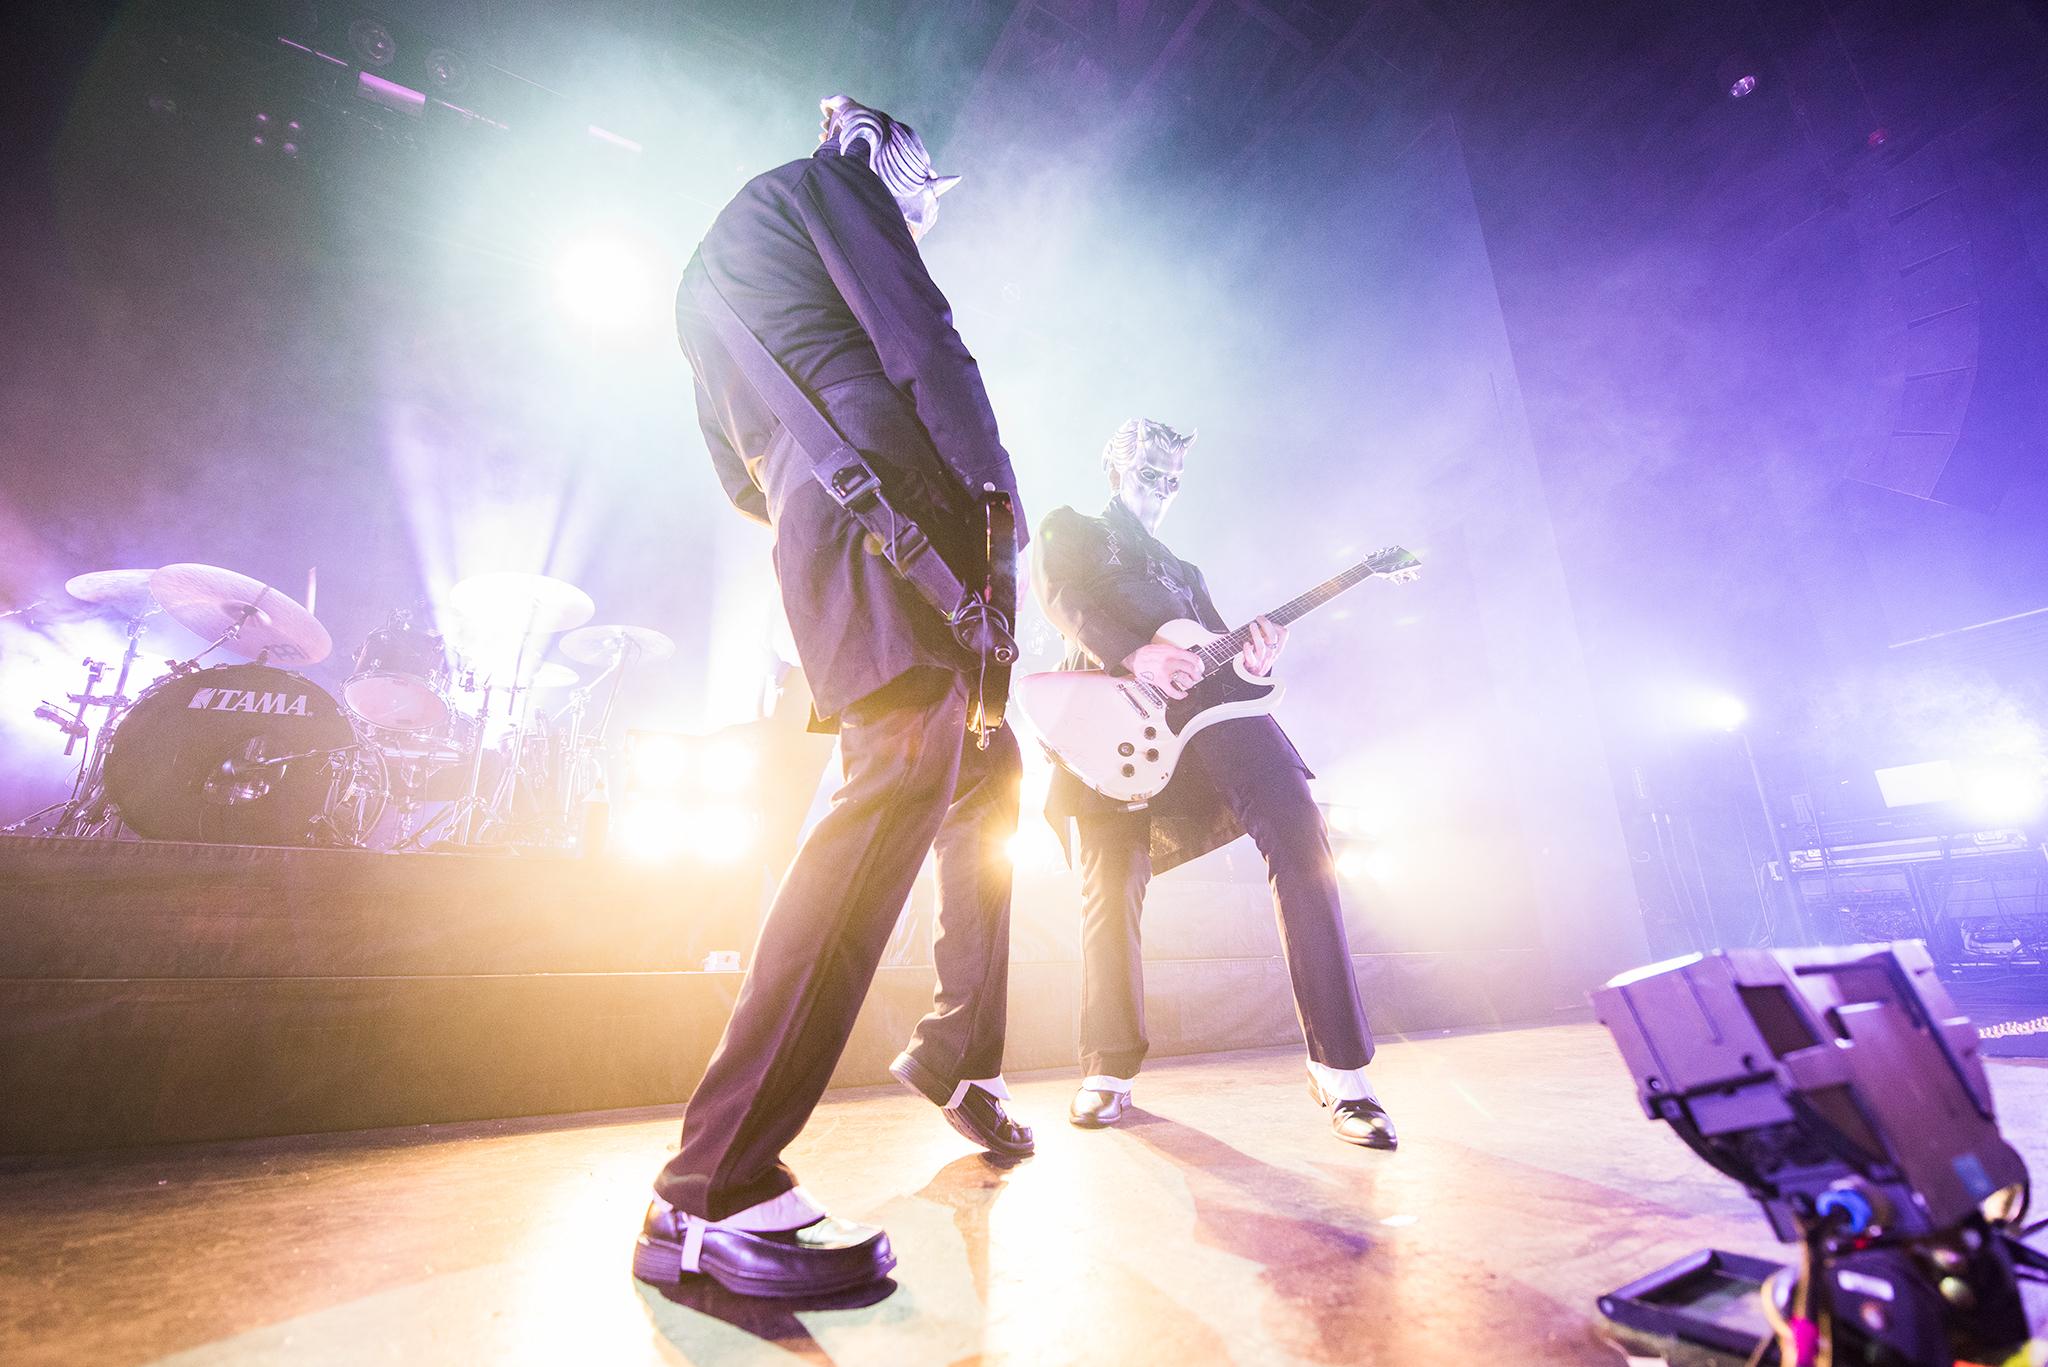 Ghost-Emos-Concert-Photography-Katrina-Barber-6.jpg